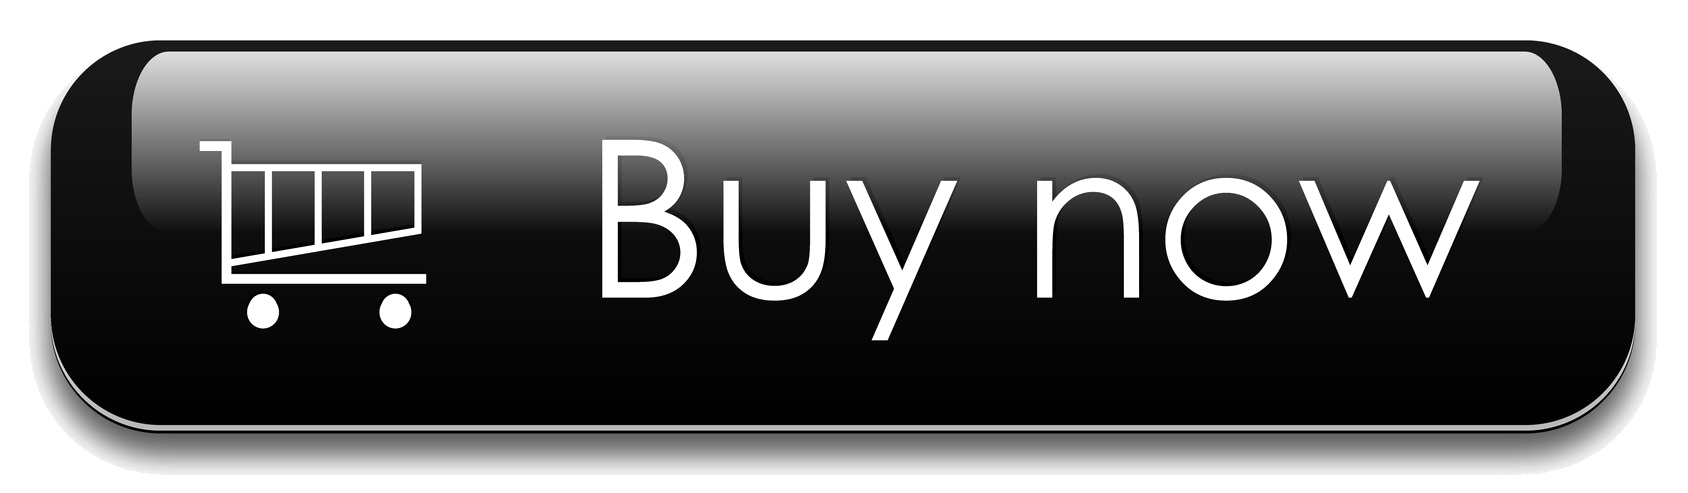 buynow_button.jpg (1688×493)